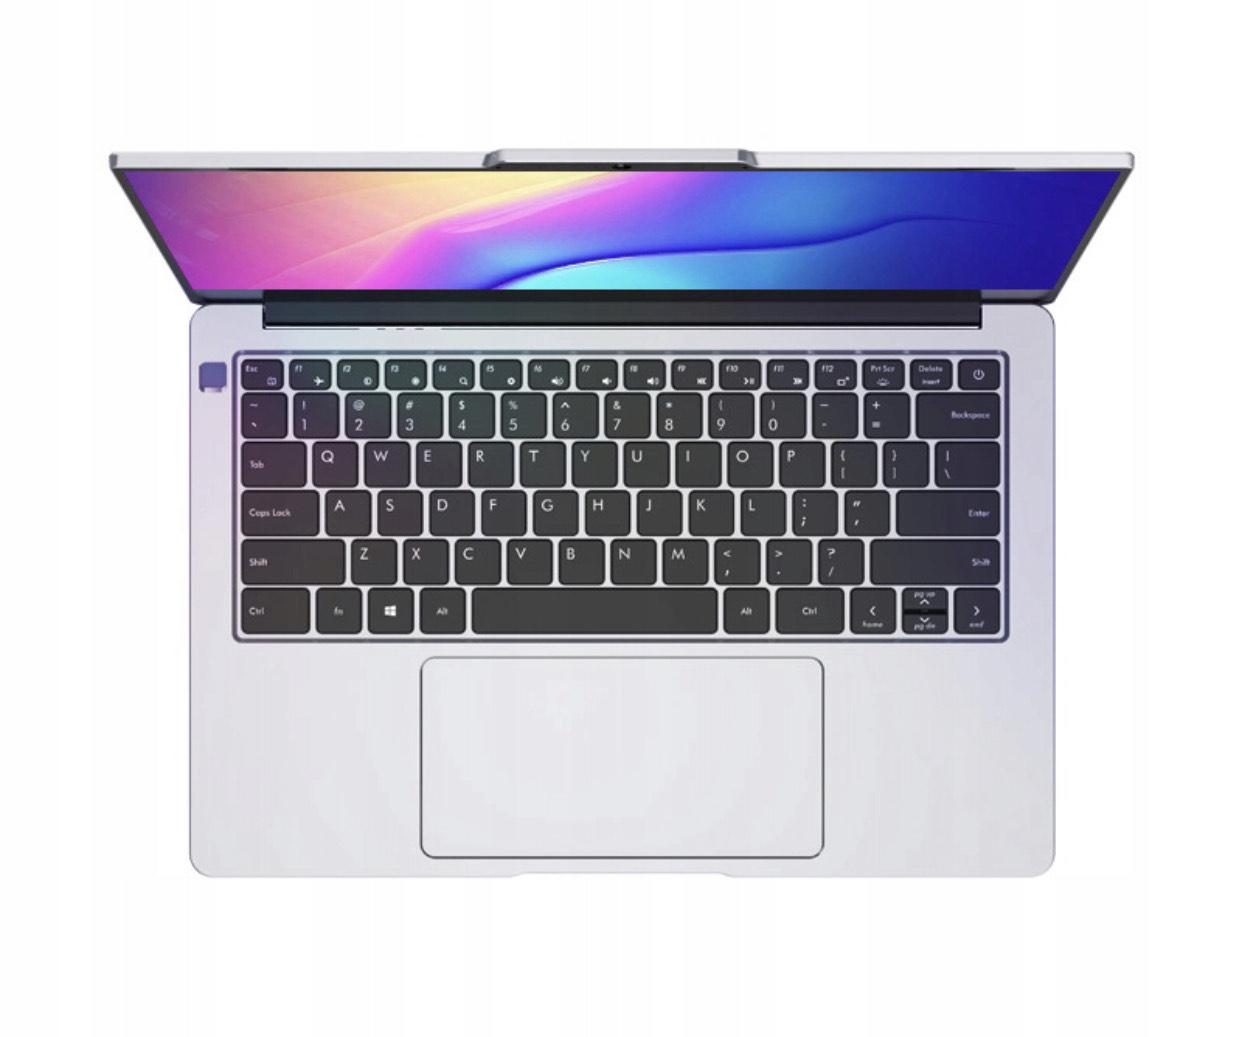 "Laptop 14"" MAIBENBEN MaiBook S431 AMD 8GB 128GB SSD WIN10 Linux + Gratis MYSZKA i PODKŁADKA"